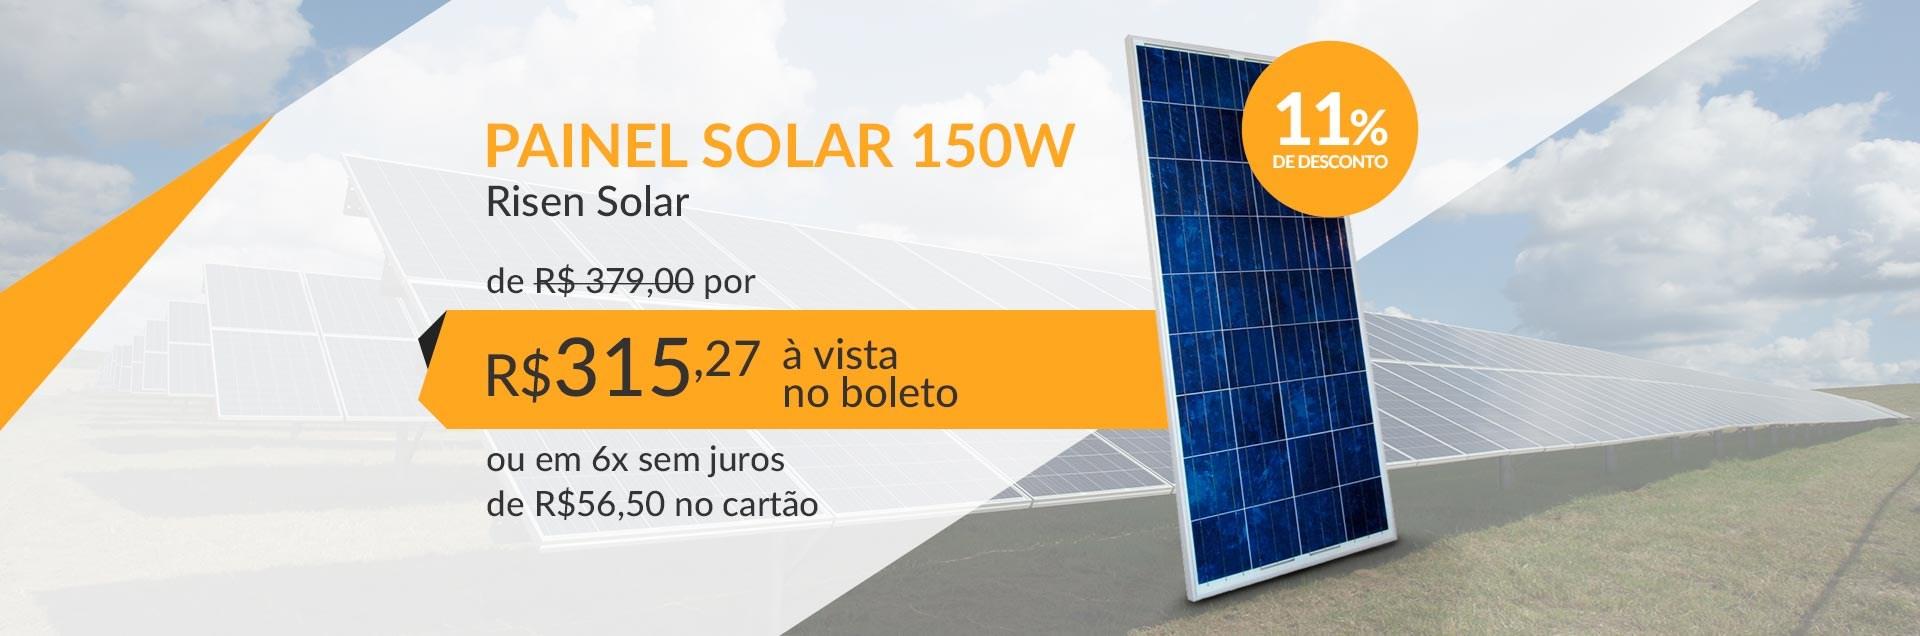 Painel Solar 150W Risen Solar